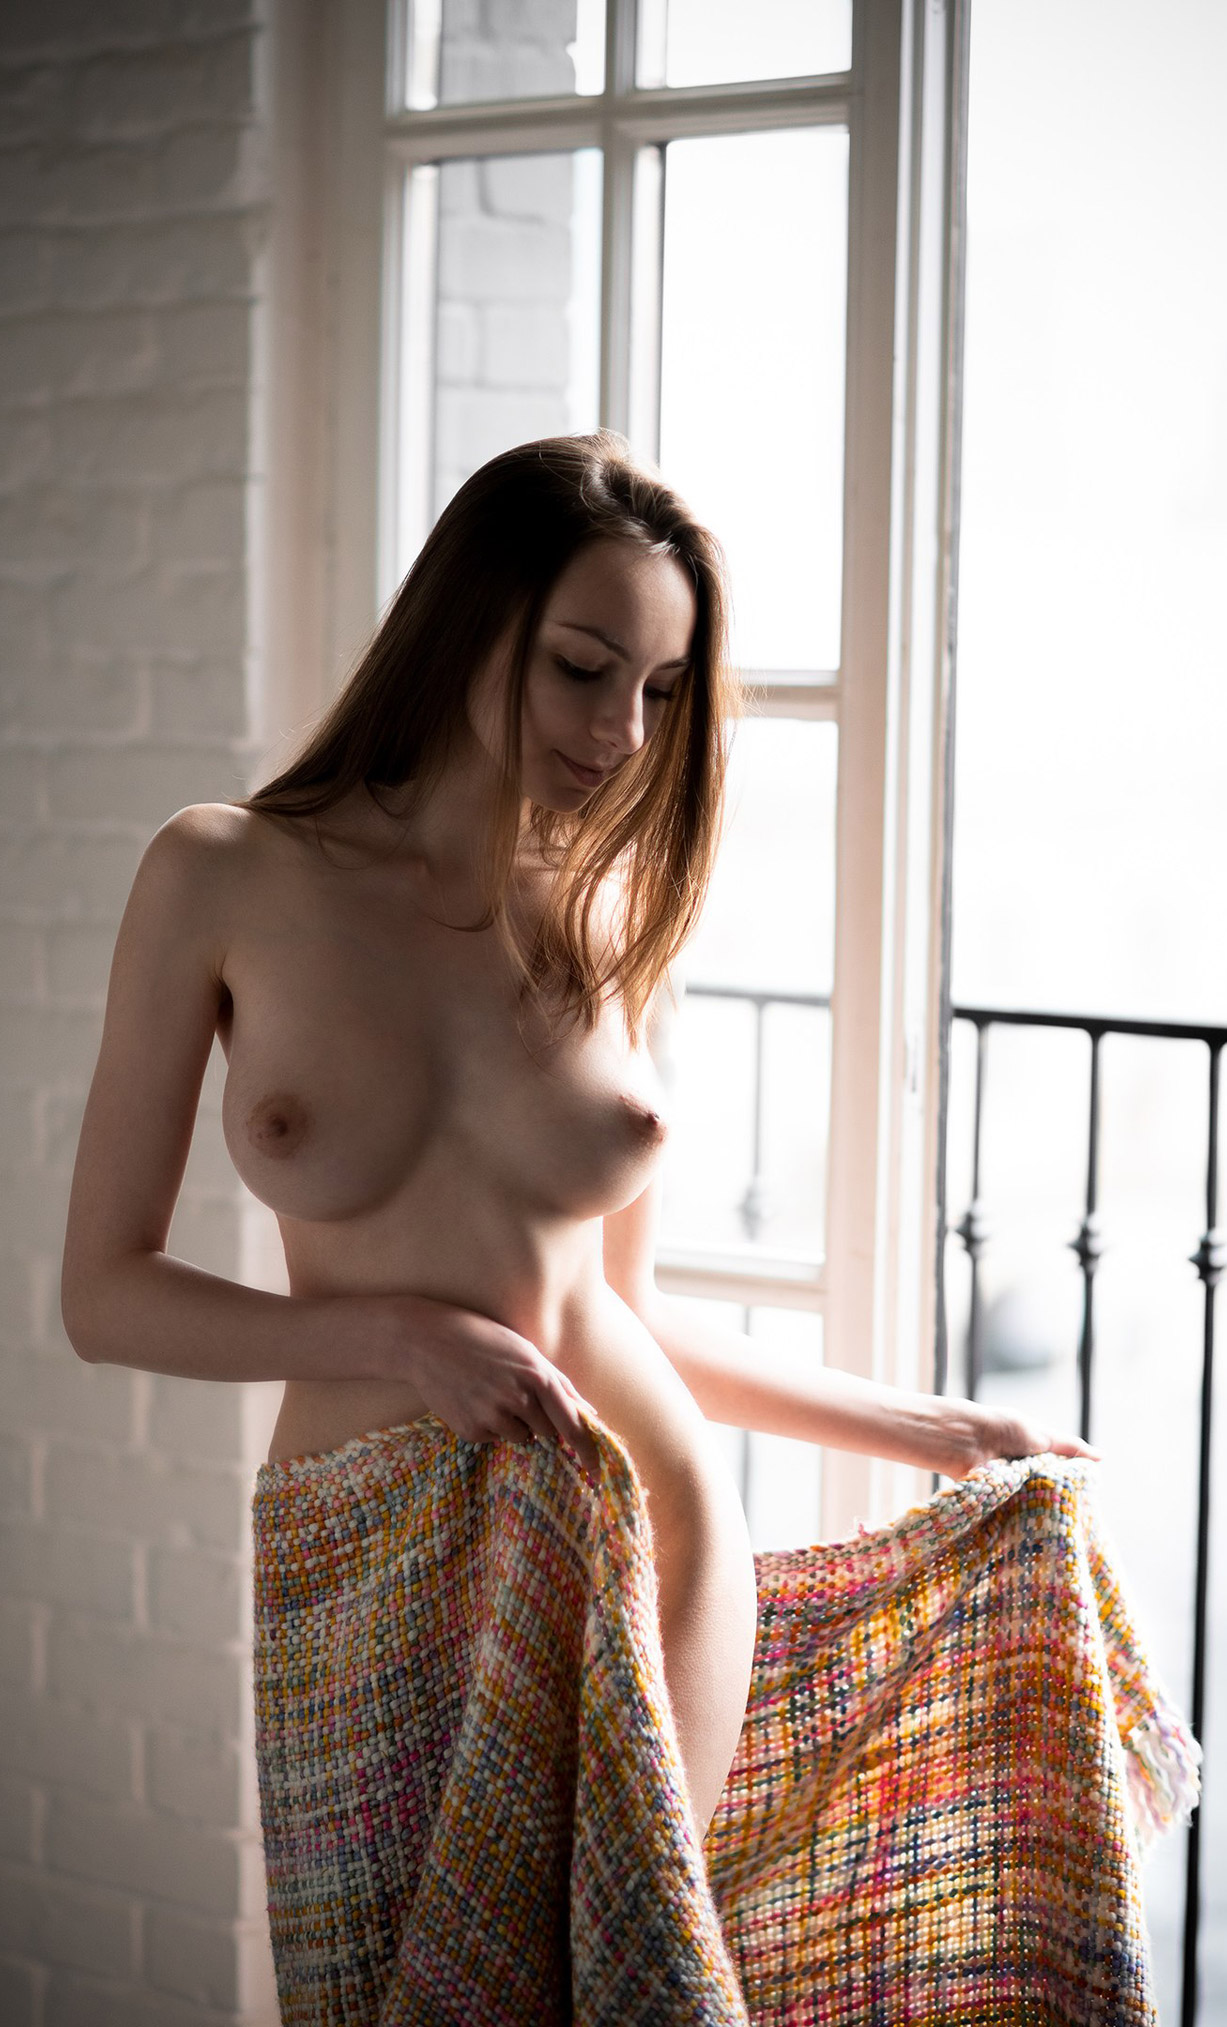 Маргарита / Margo Amp nude by Vladimir Nikolaev